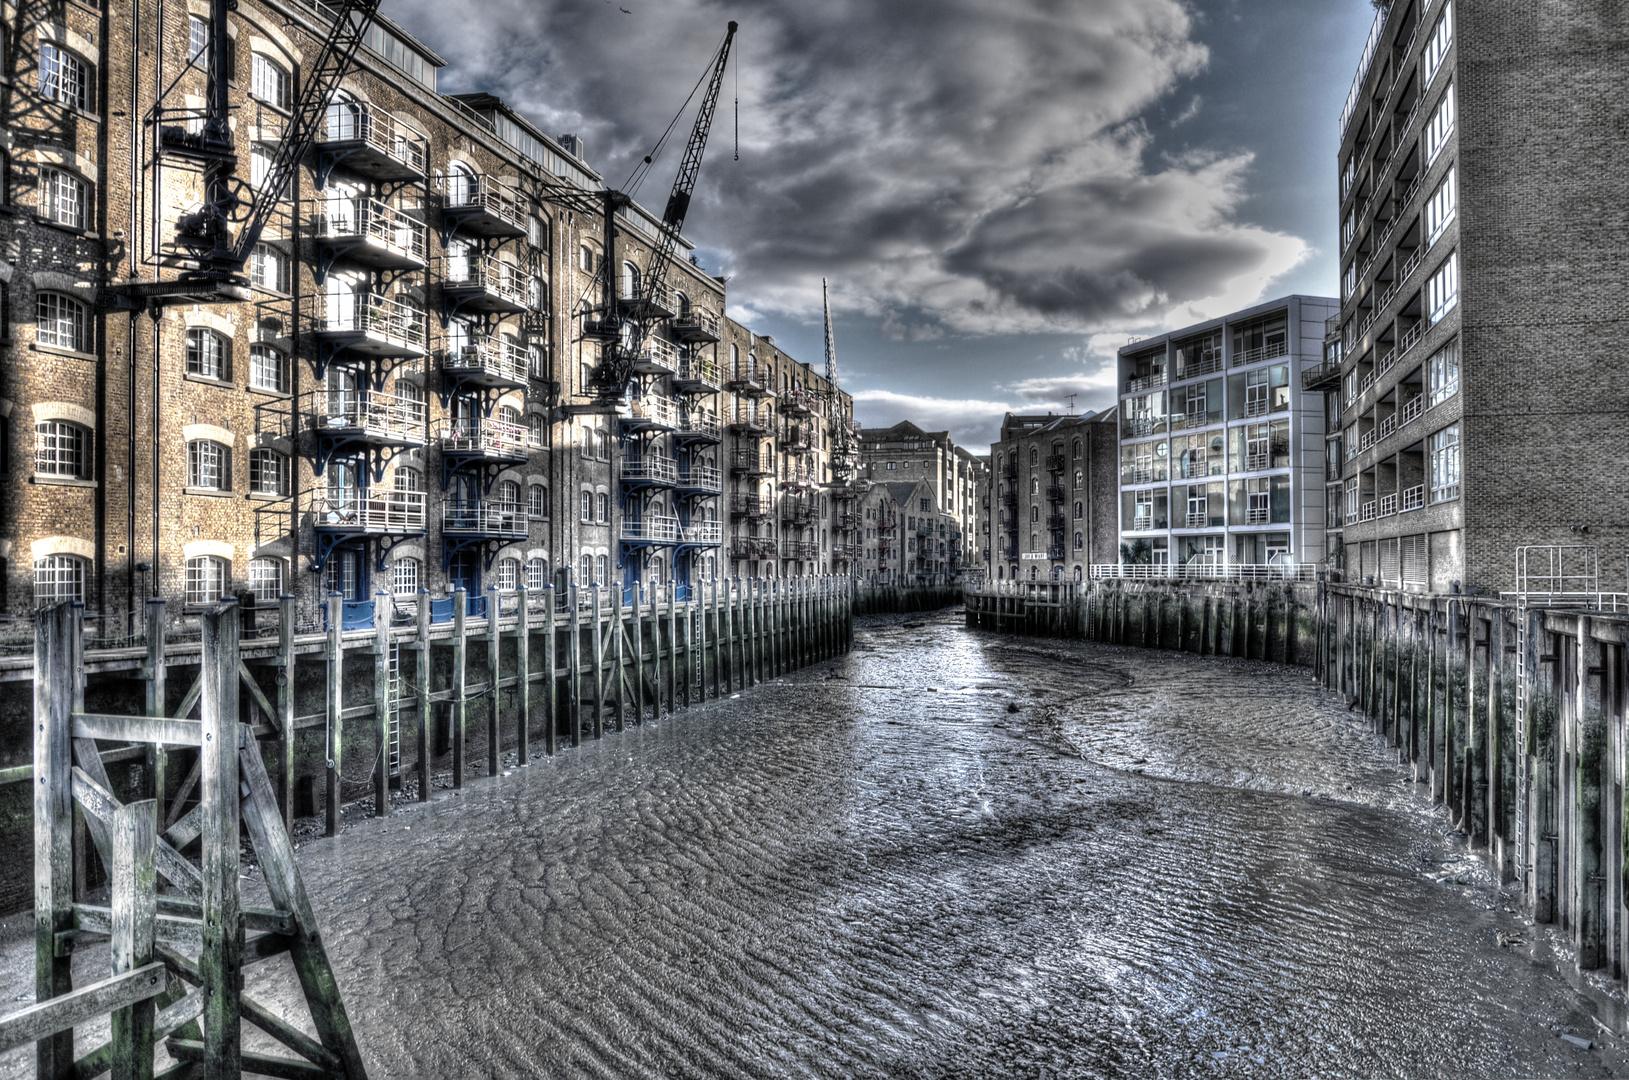 Southwark, London